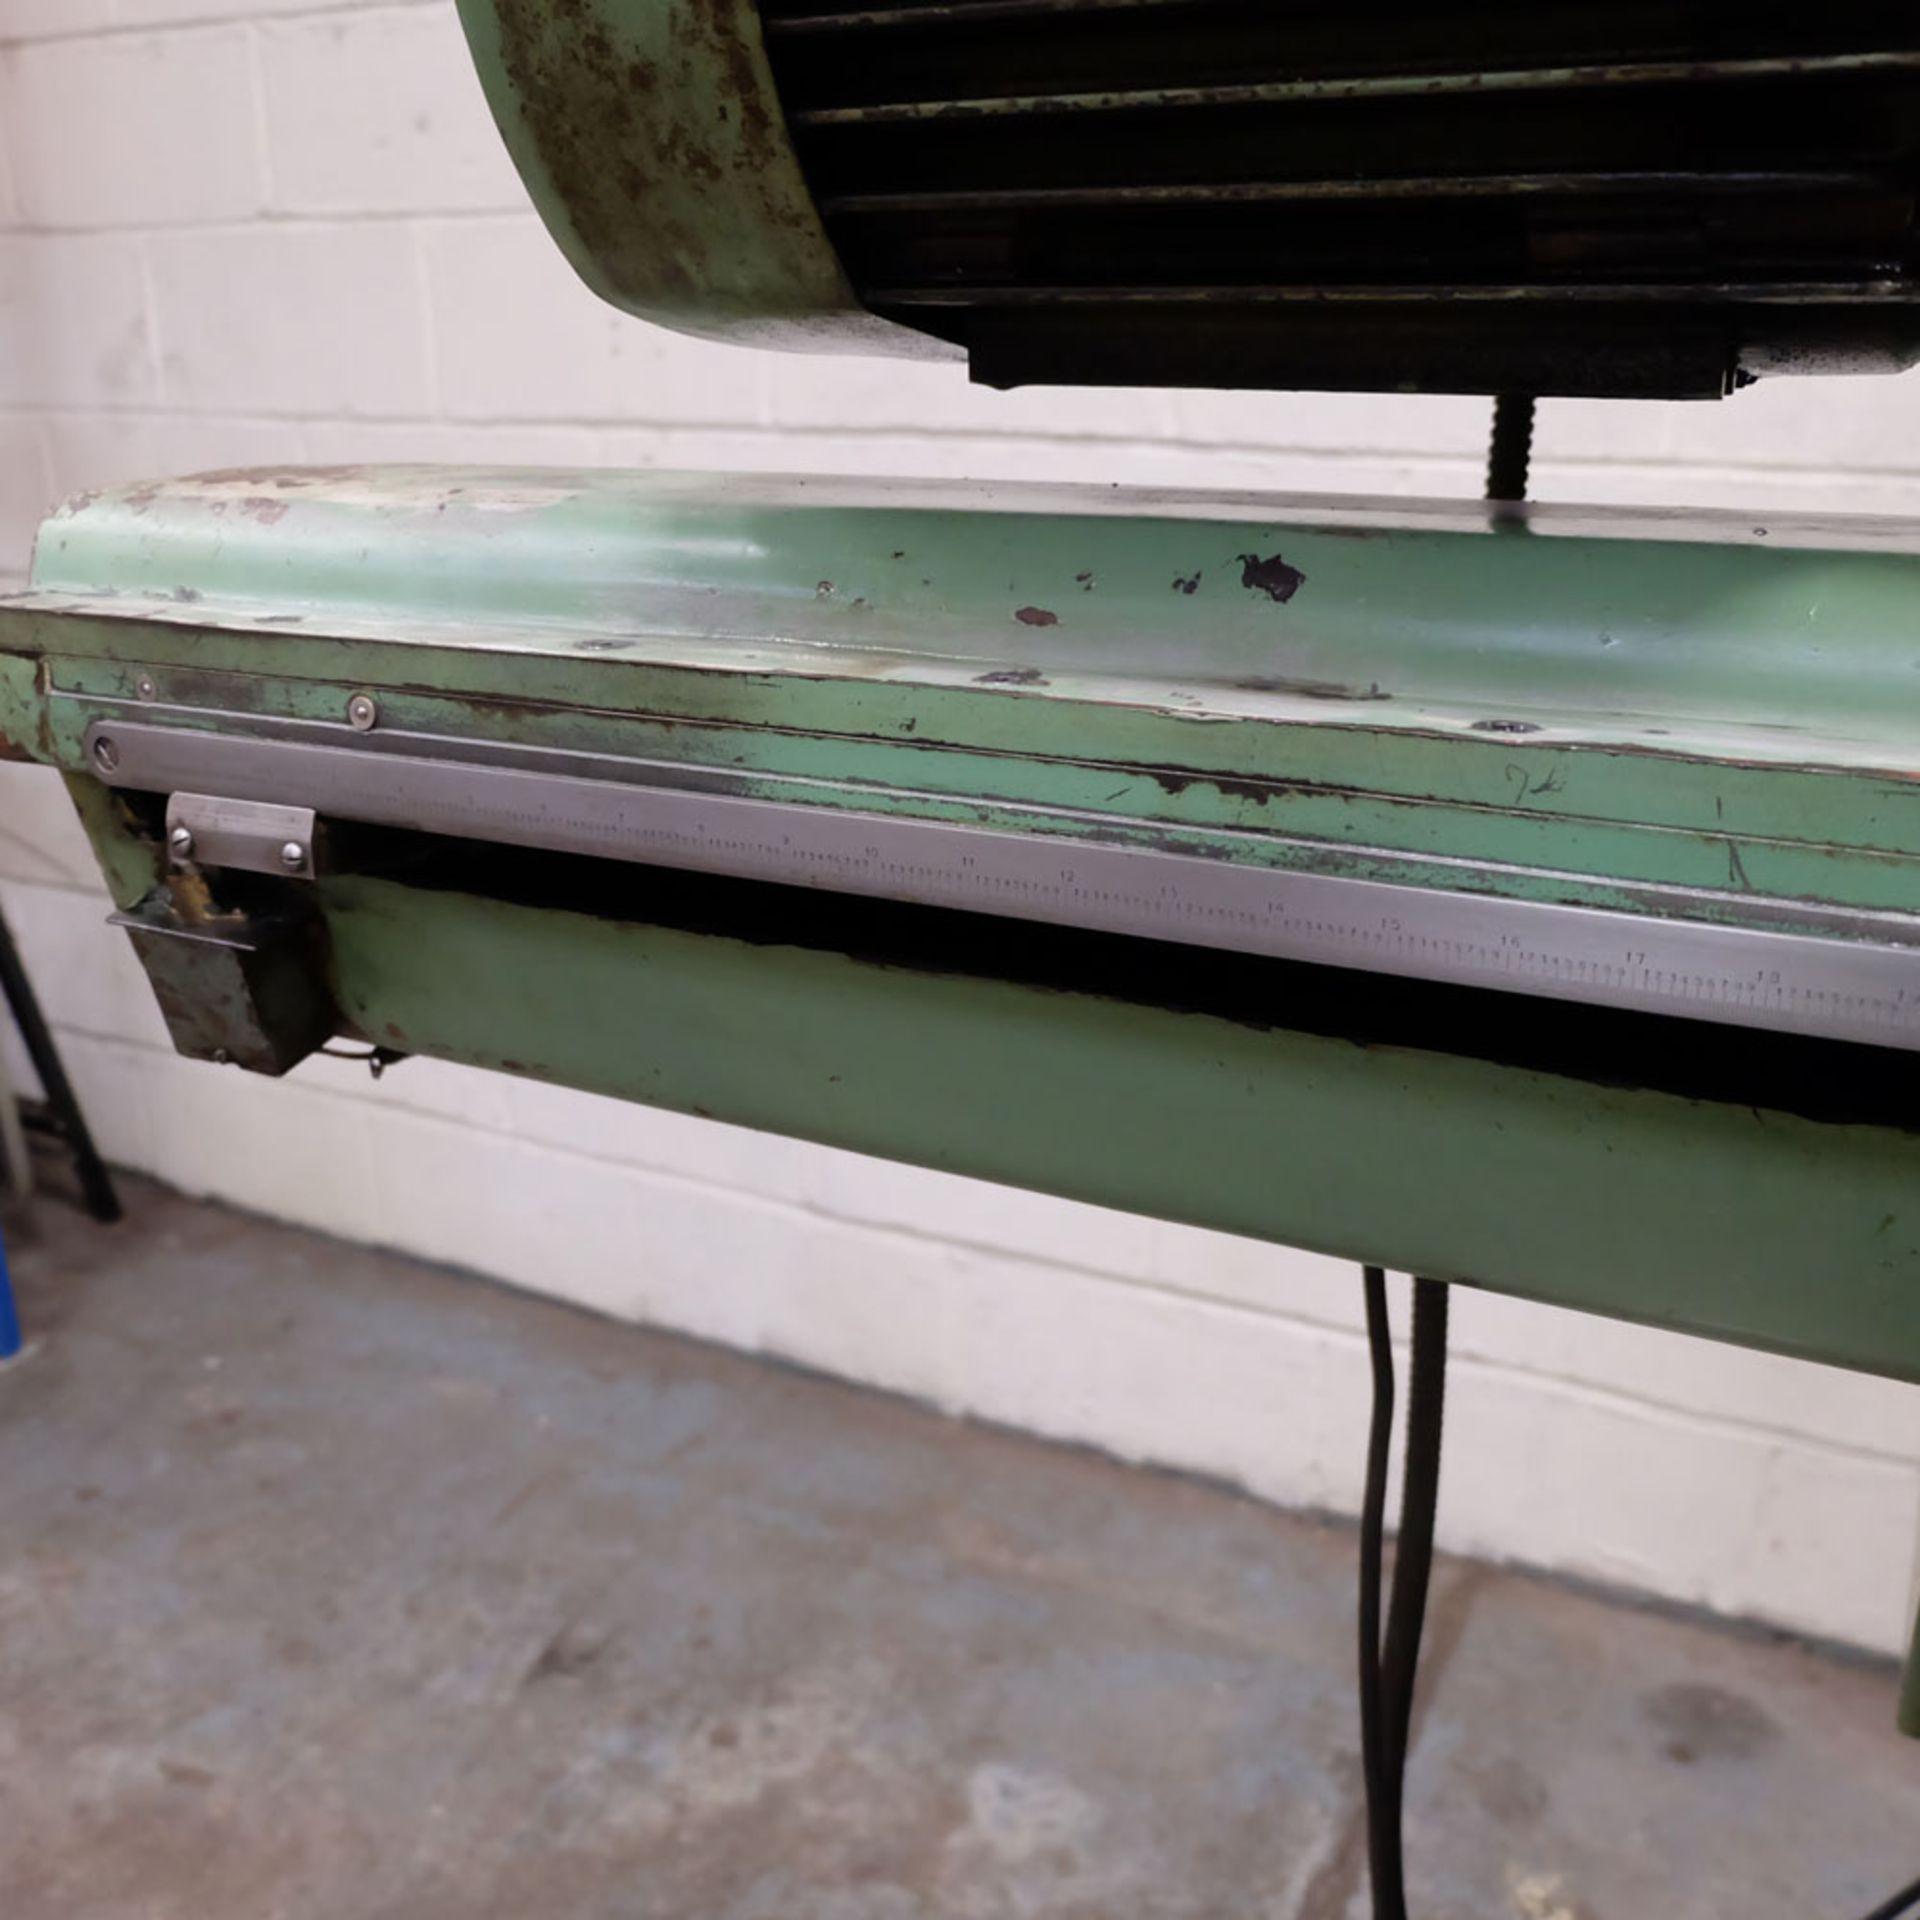 Juaristi Model MDR-55 Horizontal Boring Machine. Spindle Size: 55mm Dia. Spindle Bore: No.4 MT. - Image 13 of 14